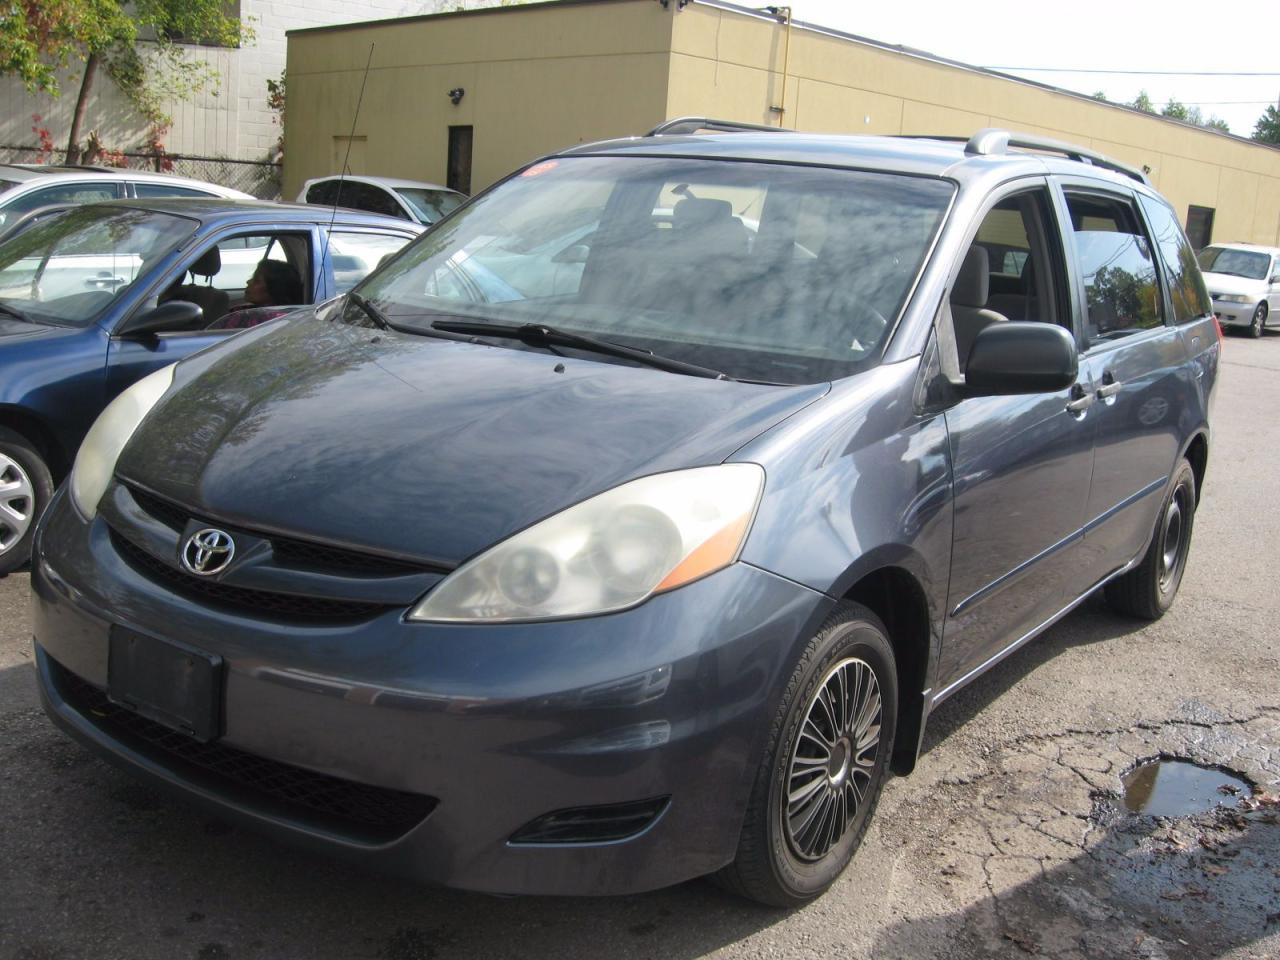 Photo of Gray 2006 Toyota Sienna